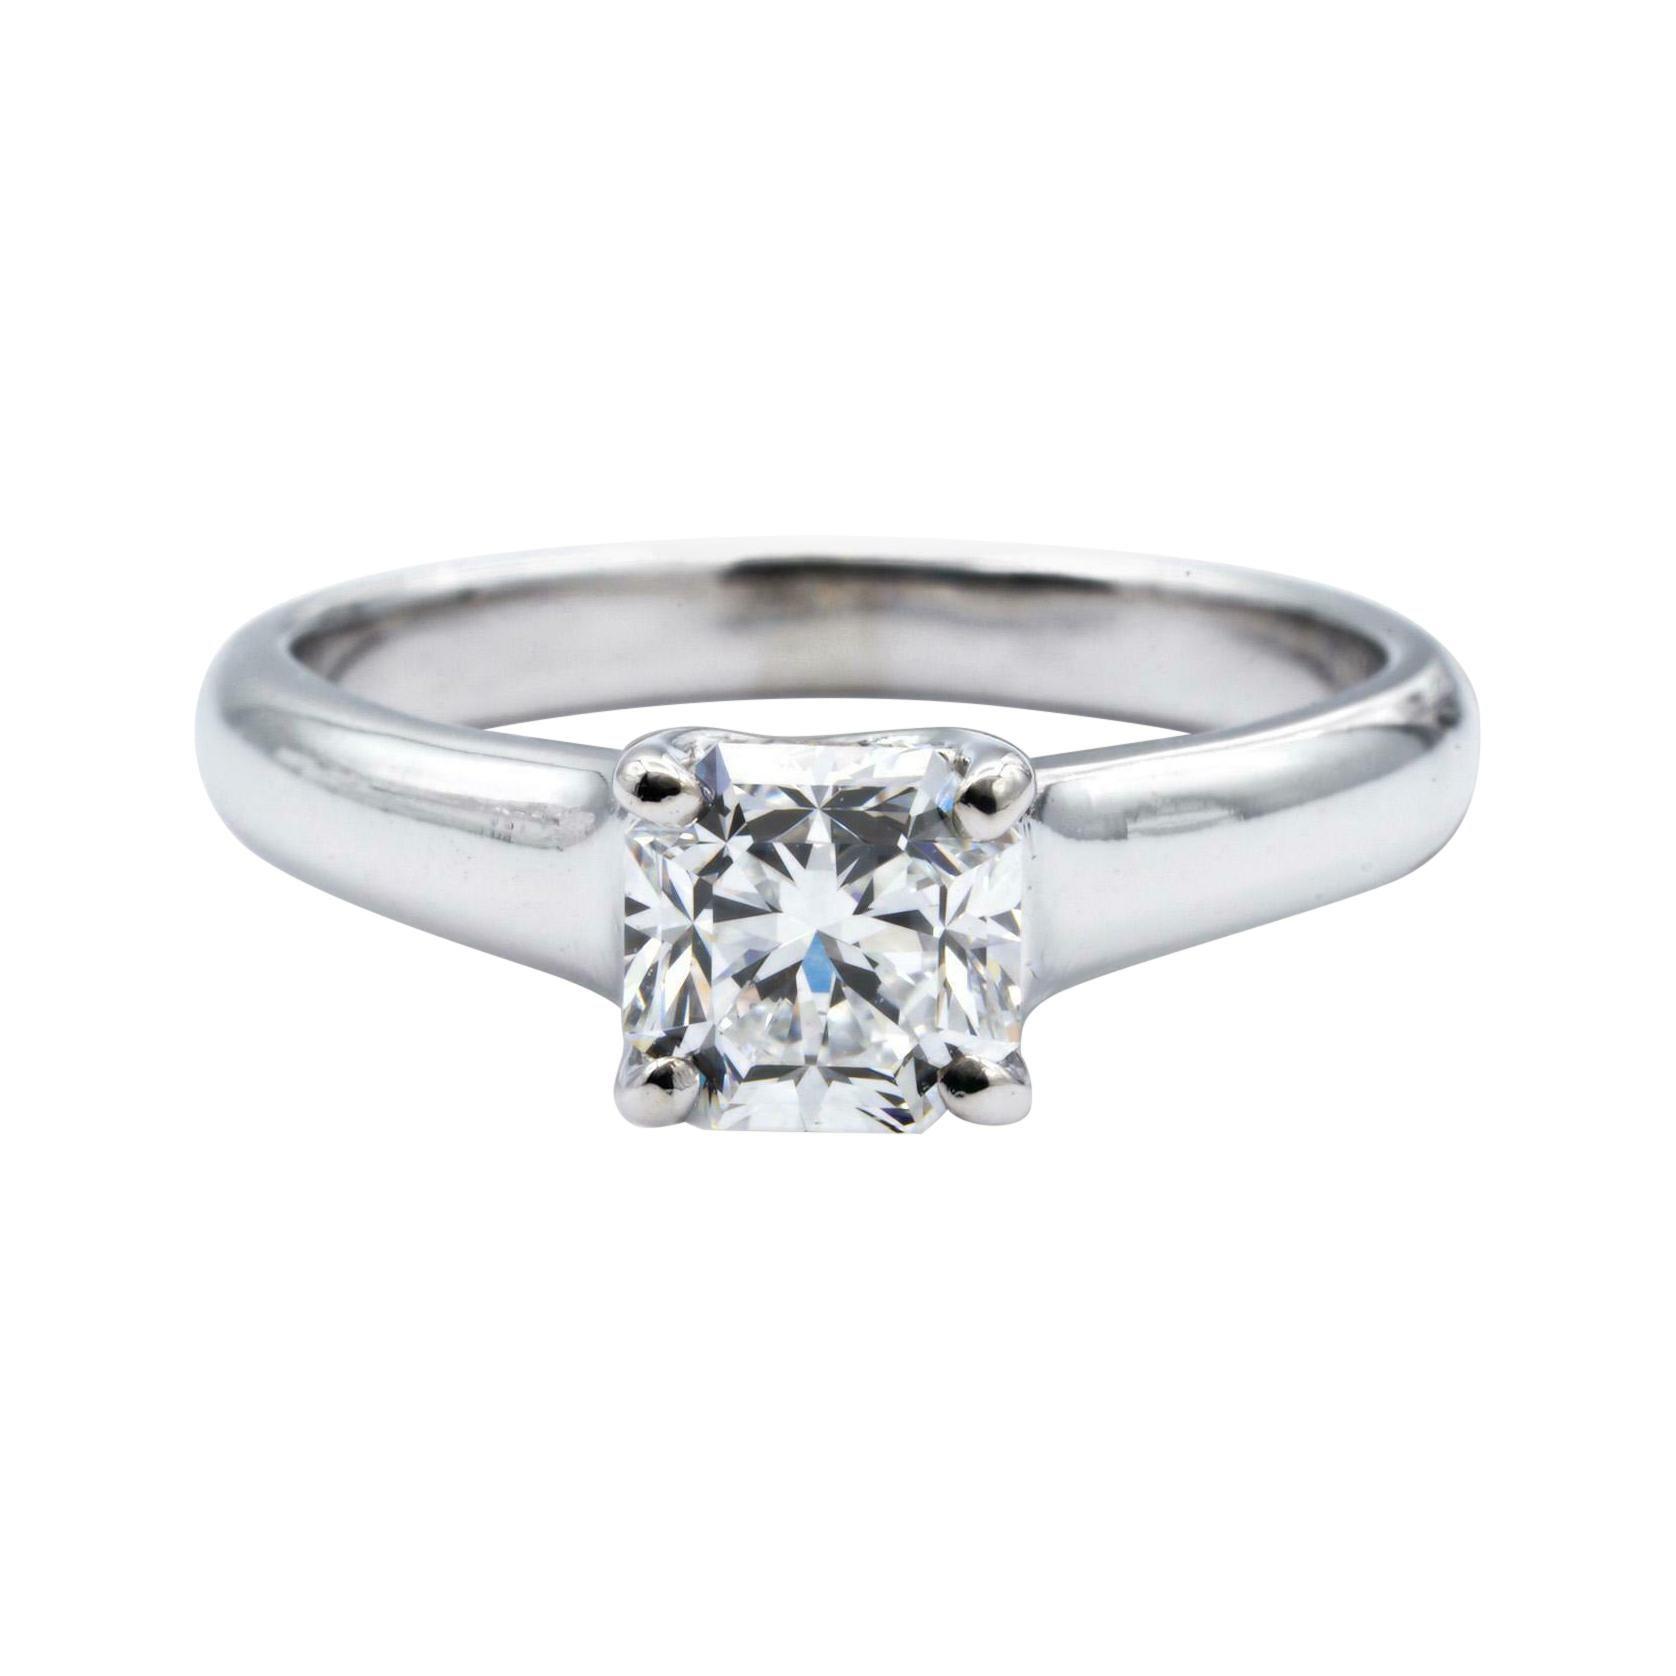 Tiffany & Co. Lucida Diamond Engagement Ring .90 Ct E VS1 Platinum Excellent Cut